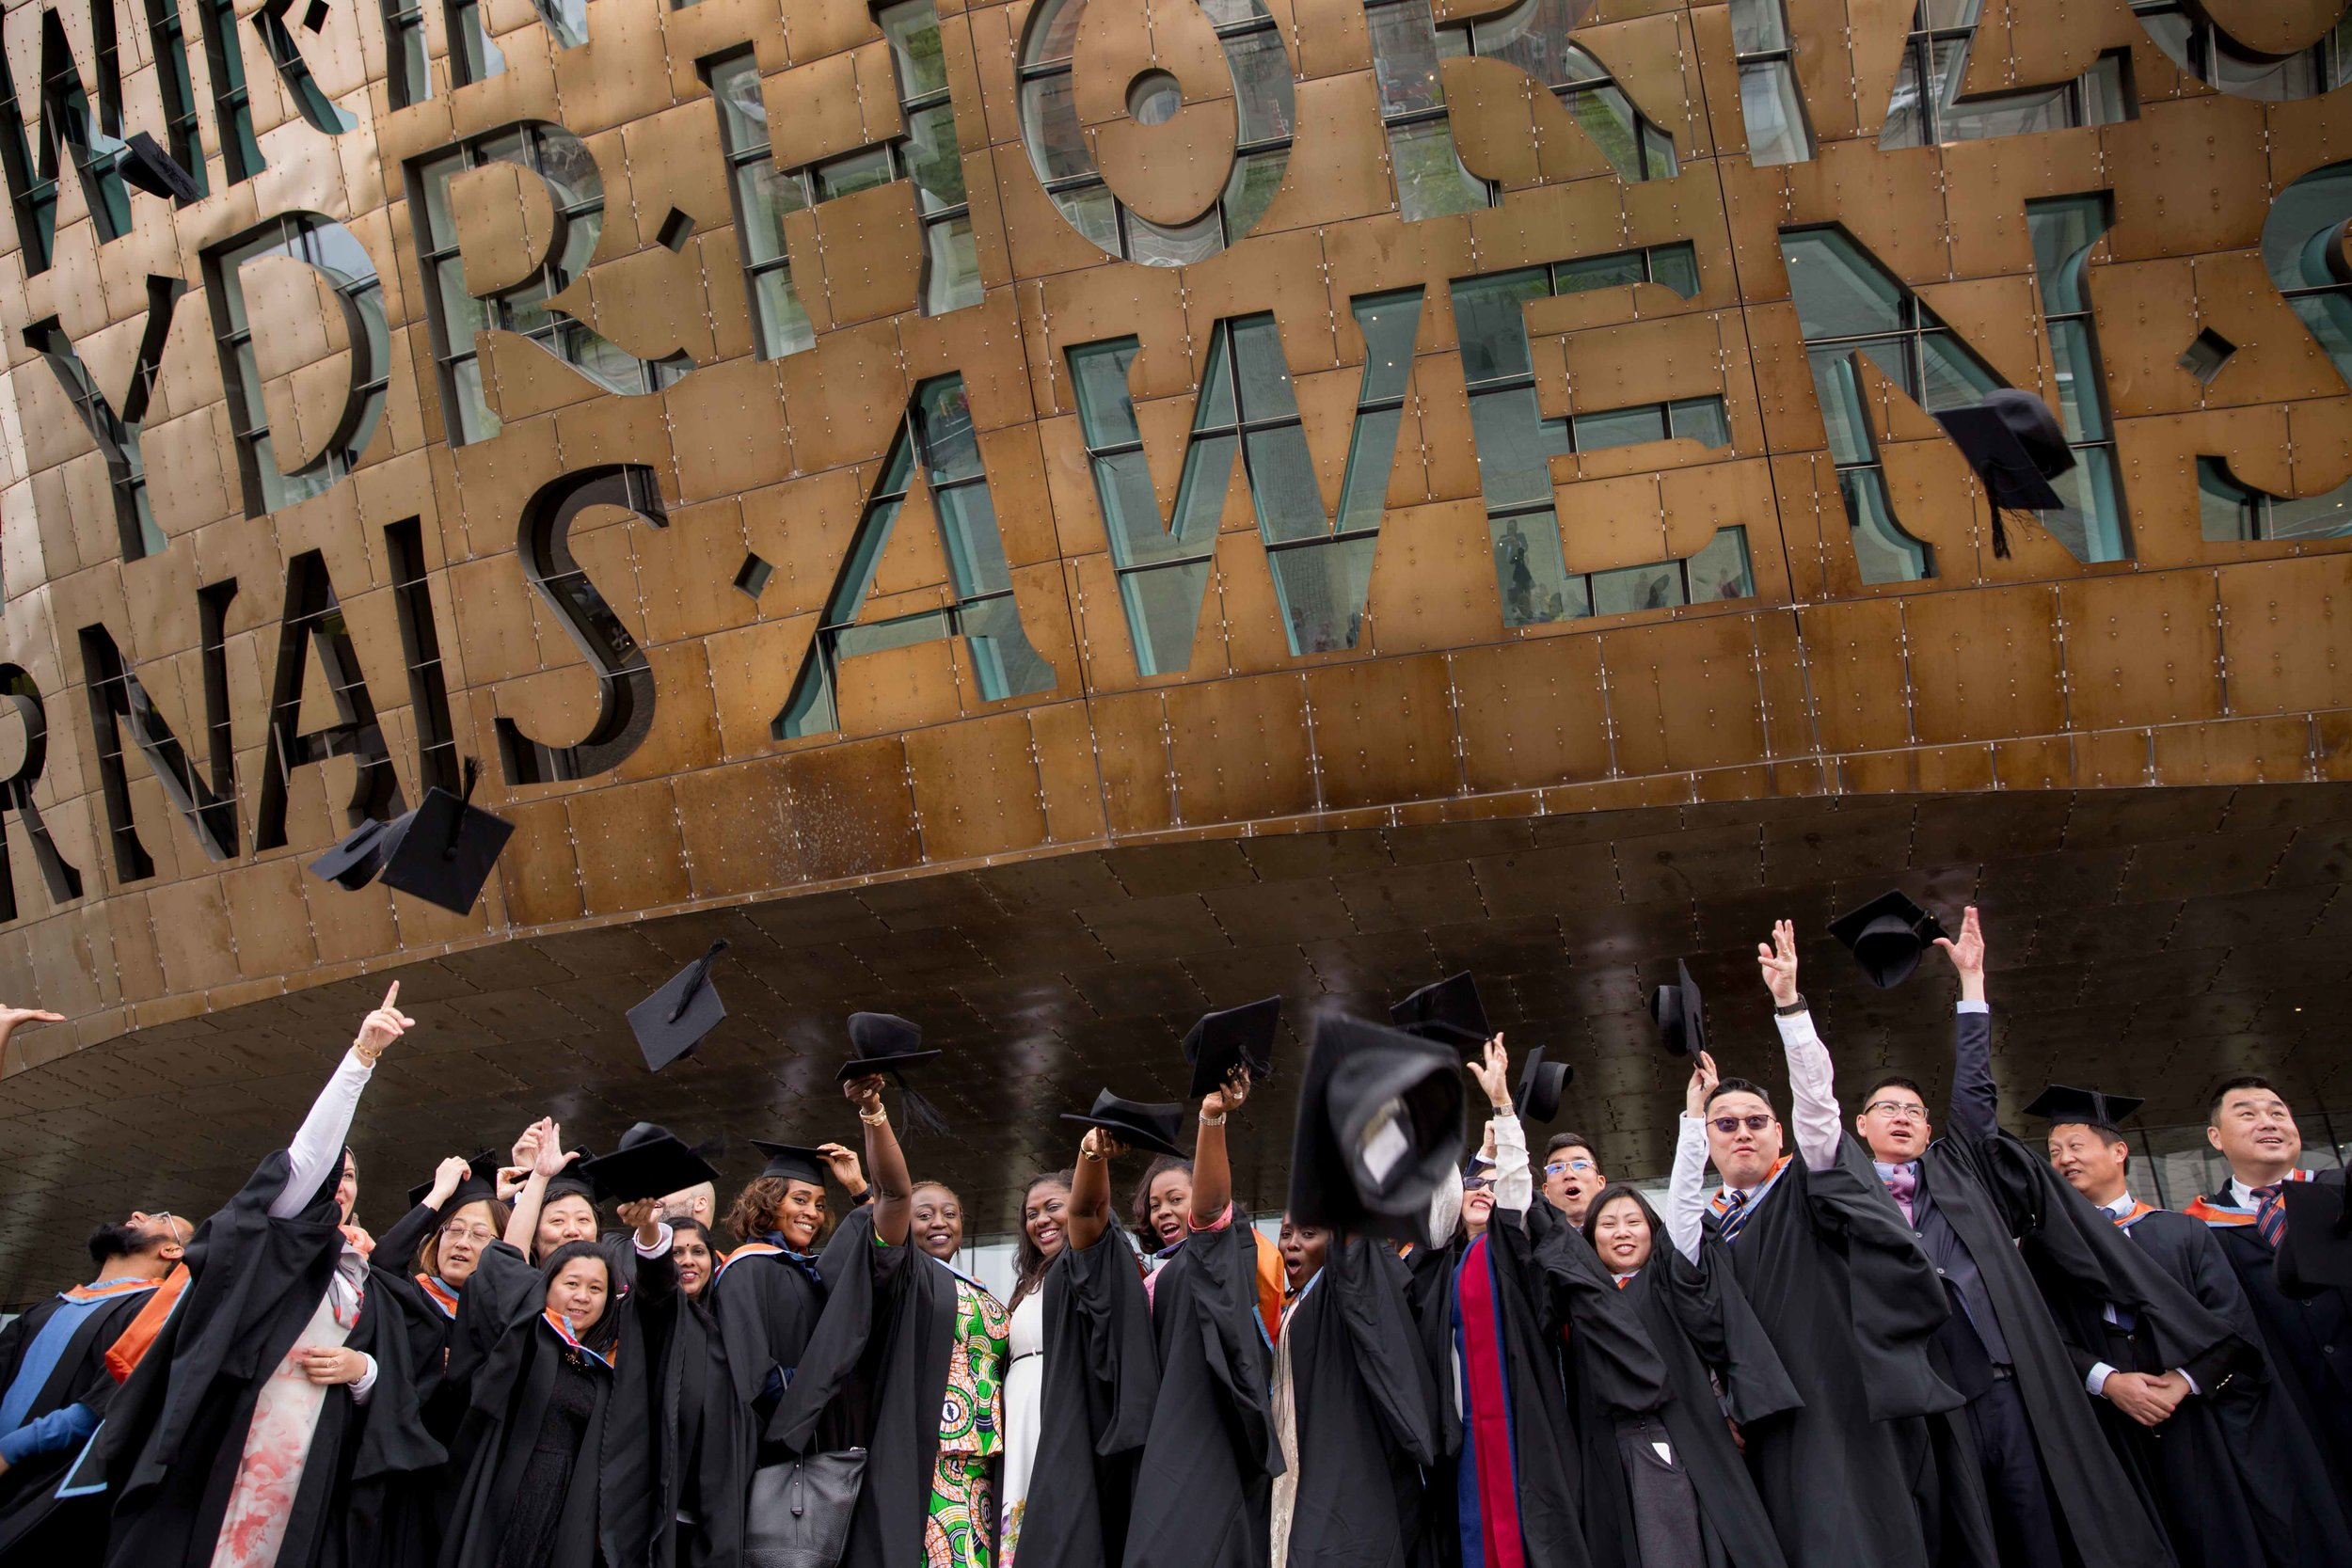 Arden-university-graduation-commercial-photographer-cardiff-natalia-smith-photography-34.jpg